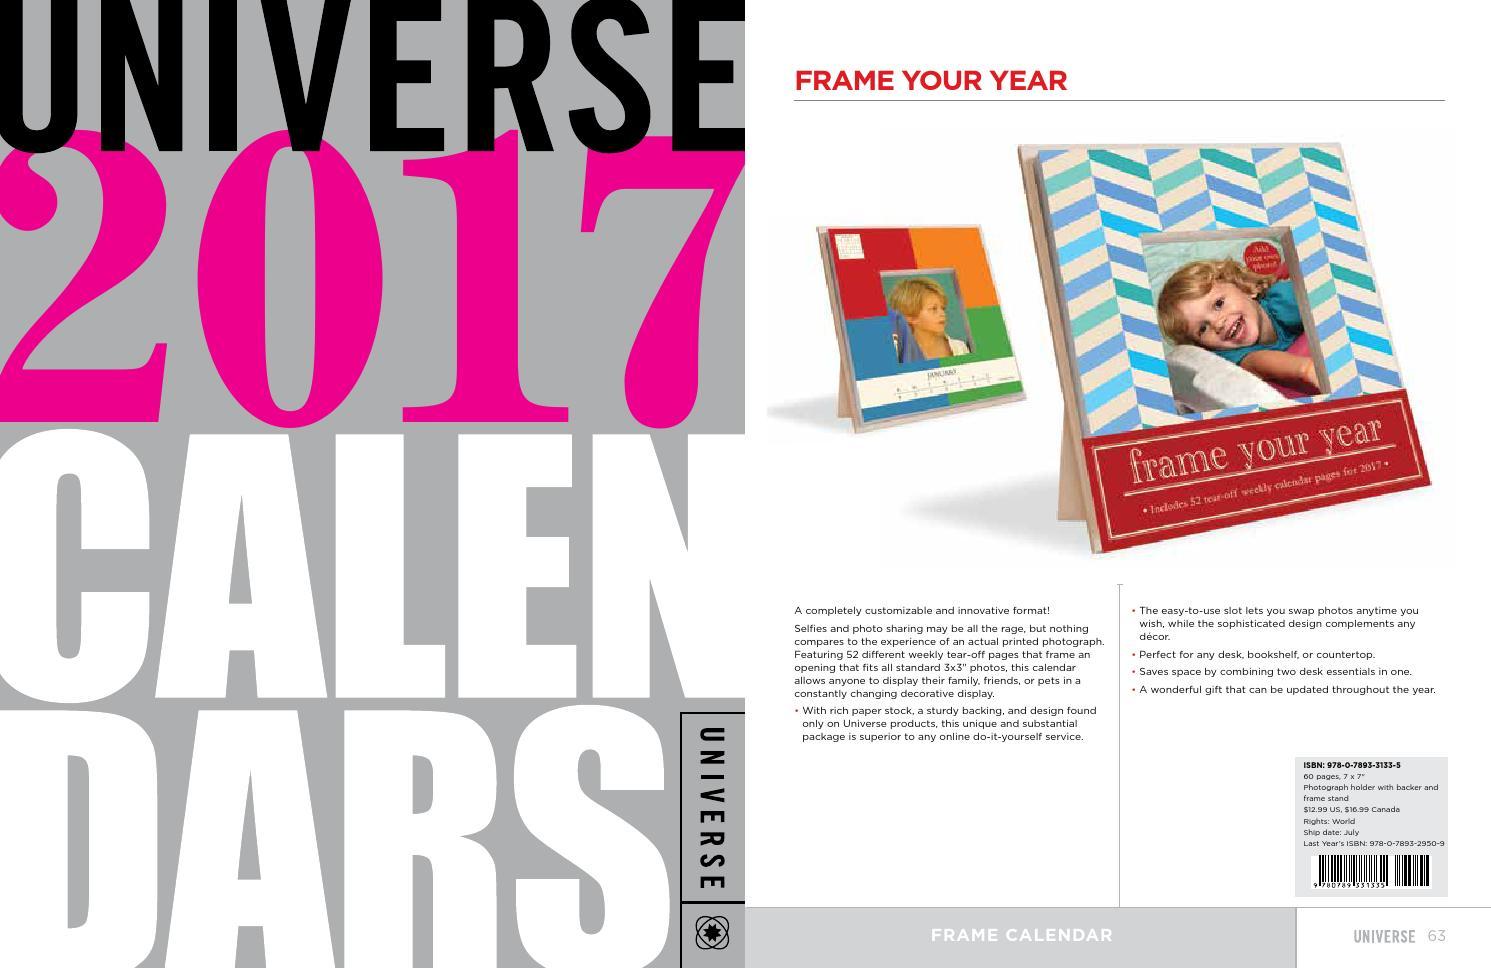 Universe publishing 2017 calendar catalog by Rizzoli International  Publications - issuu